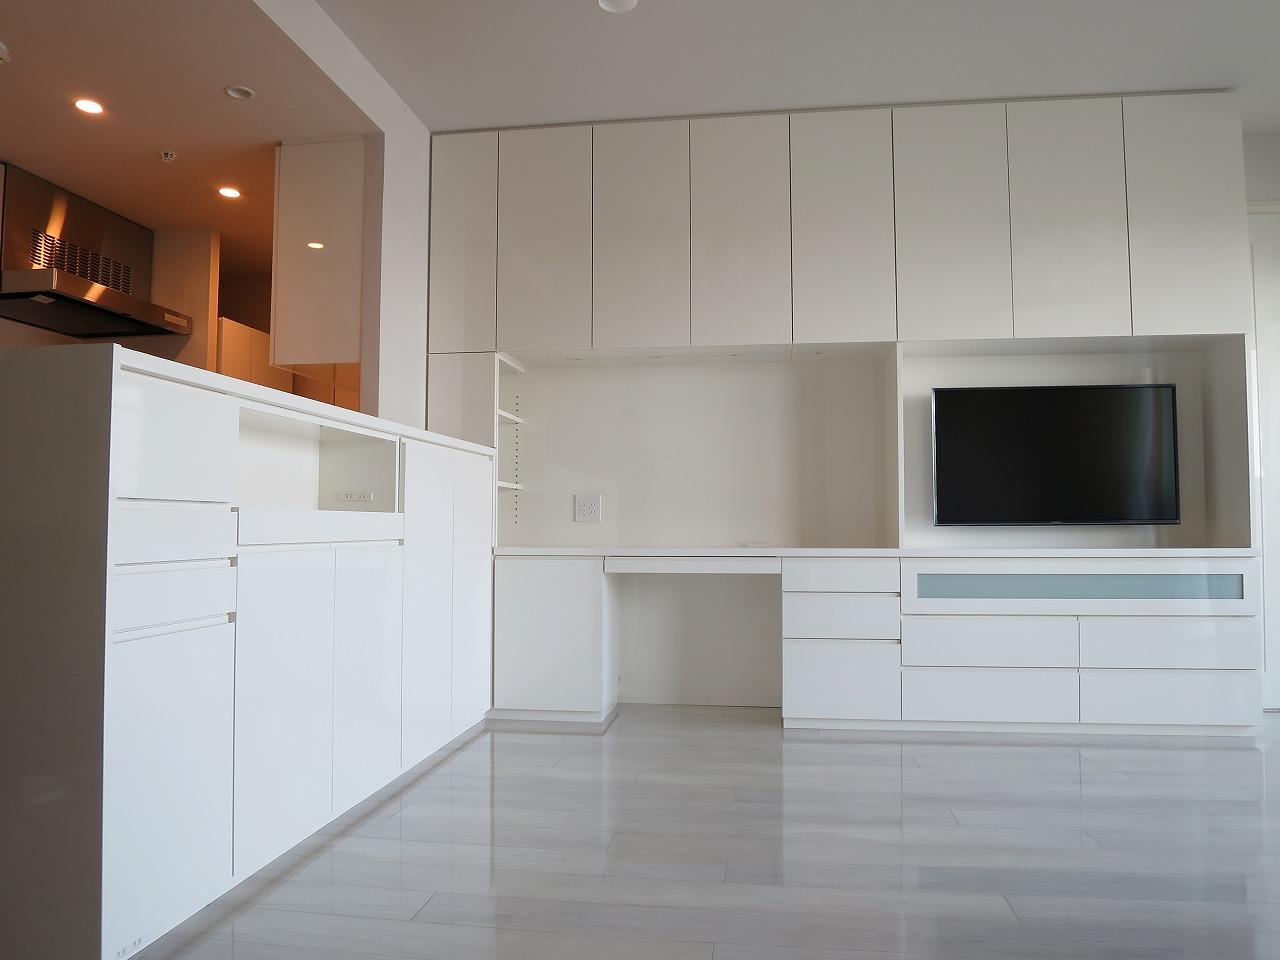 L型で繋がっている壁面収納&カウンター収納|白色鏡面仕上げ|東京都・江東区